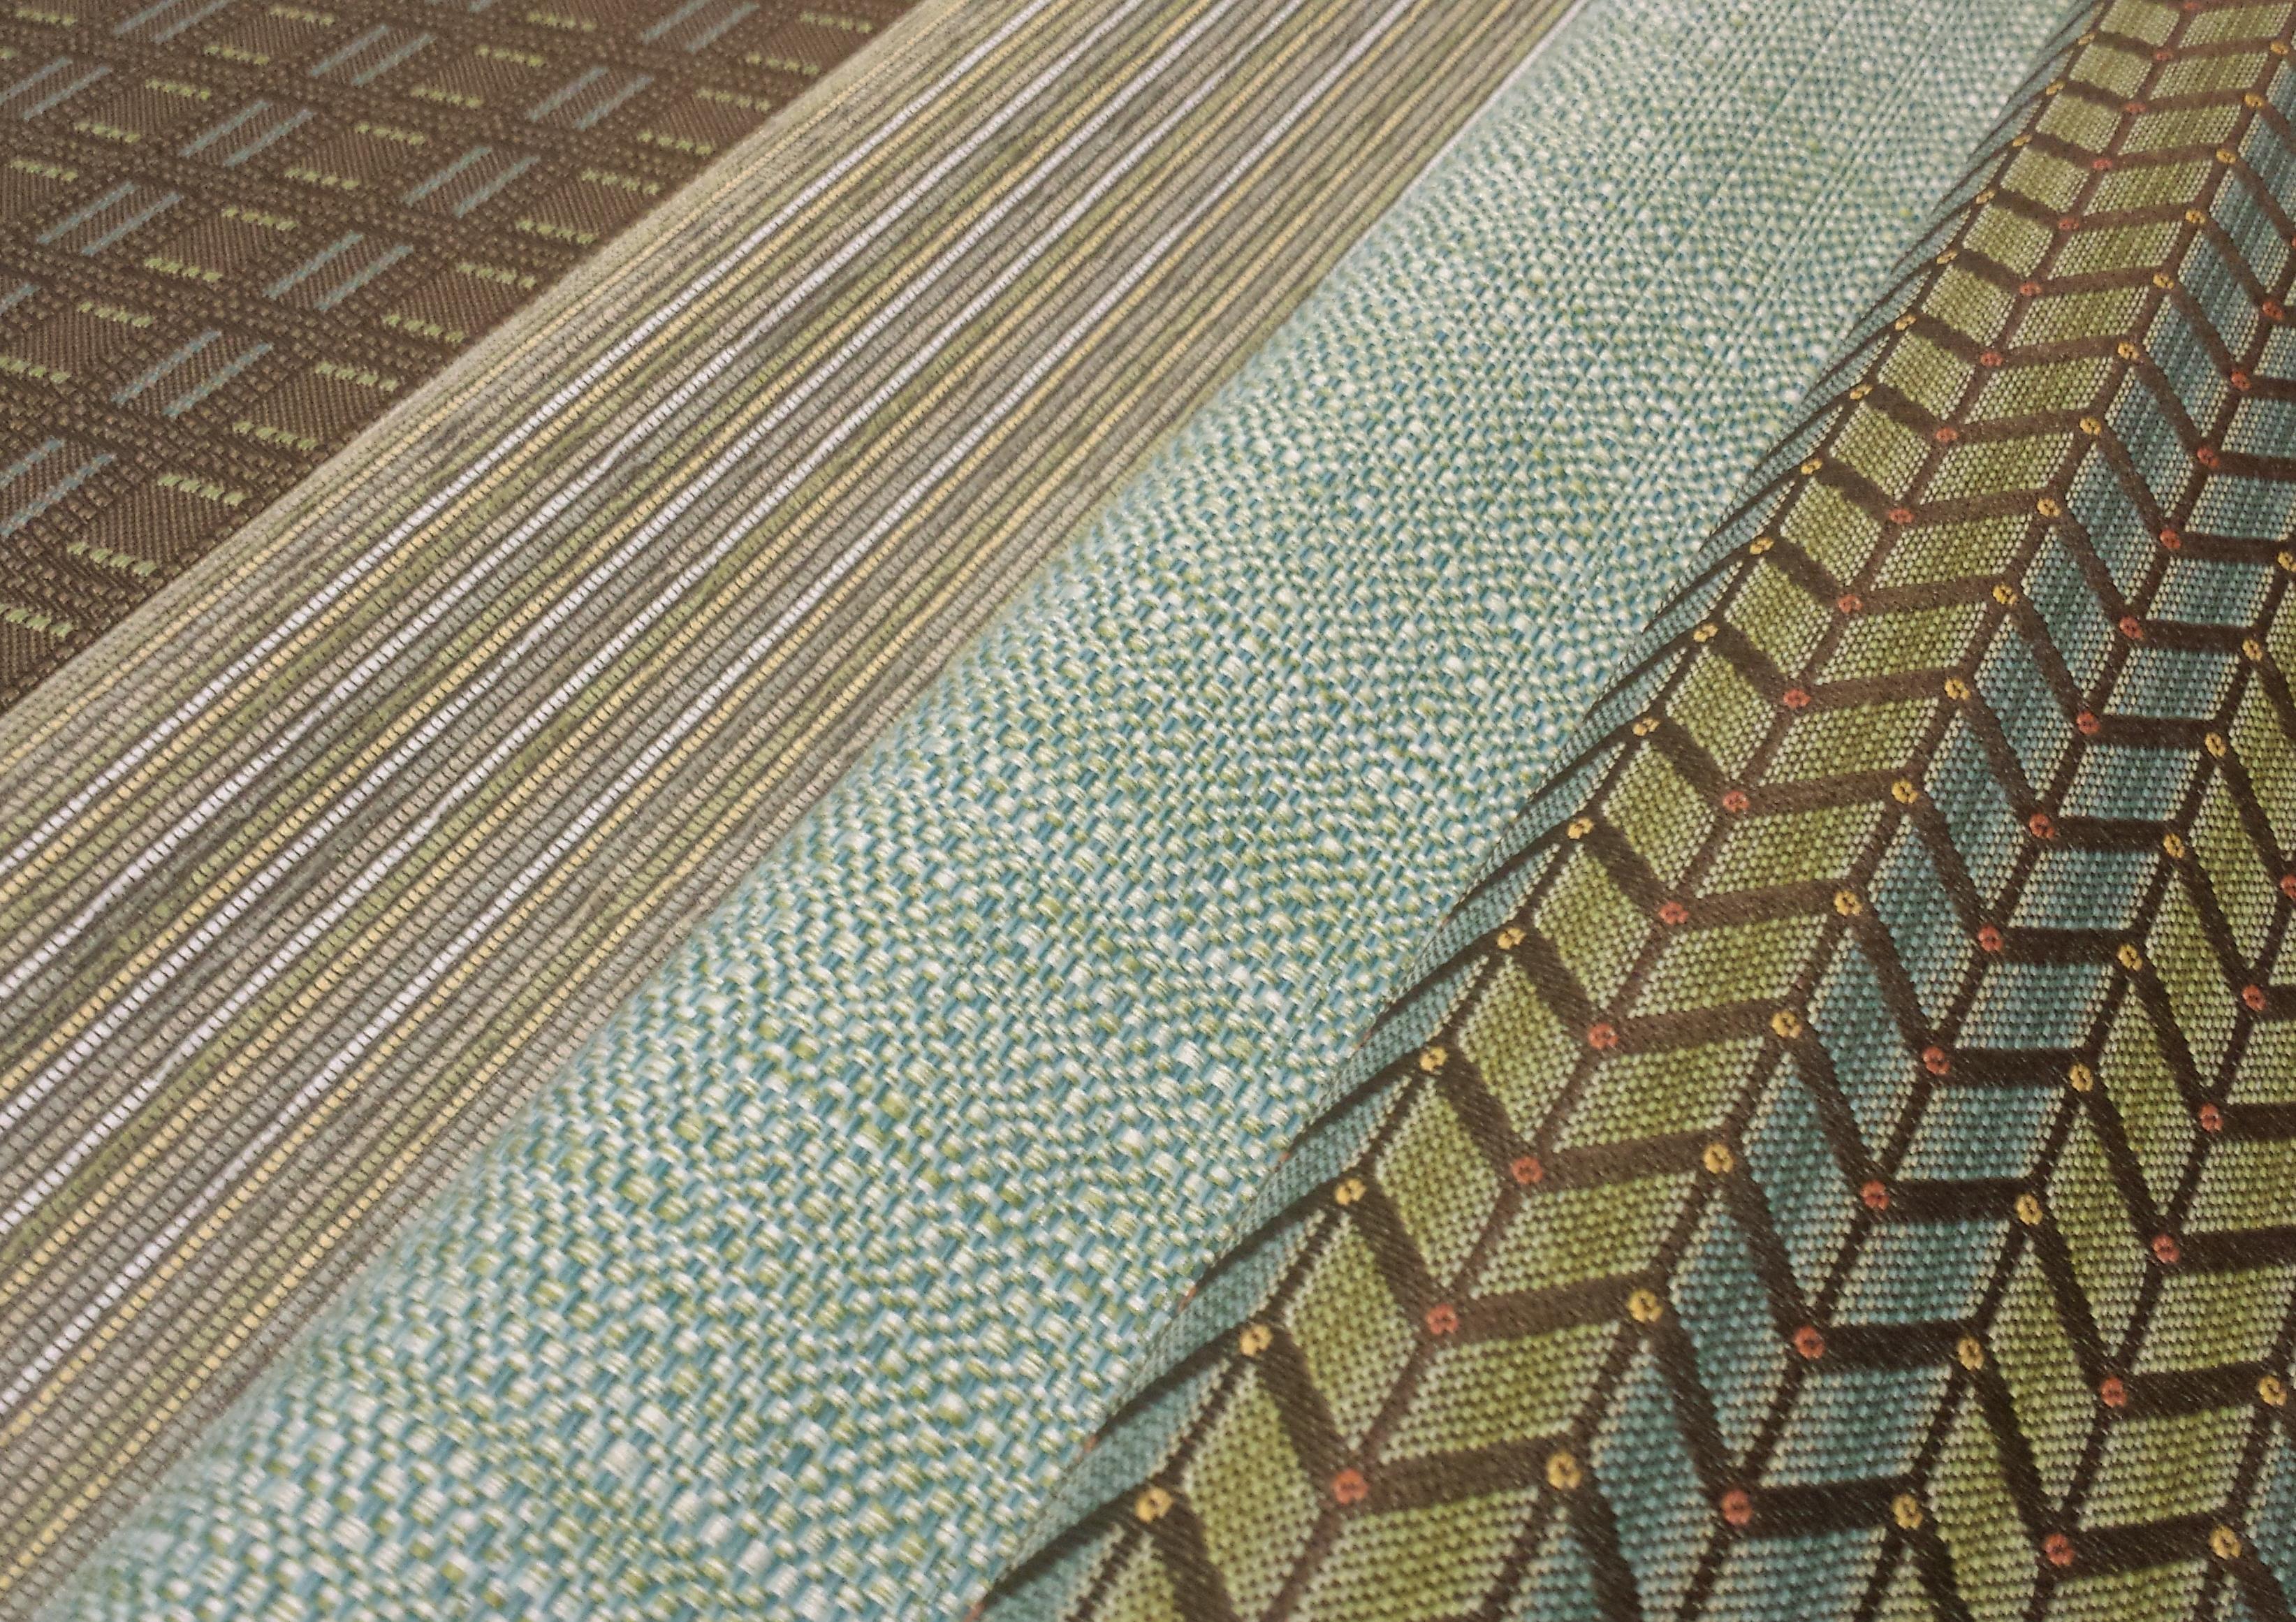 100 Automotive Upholstery Fabric Near Me